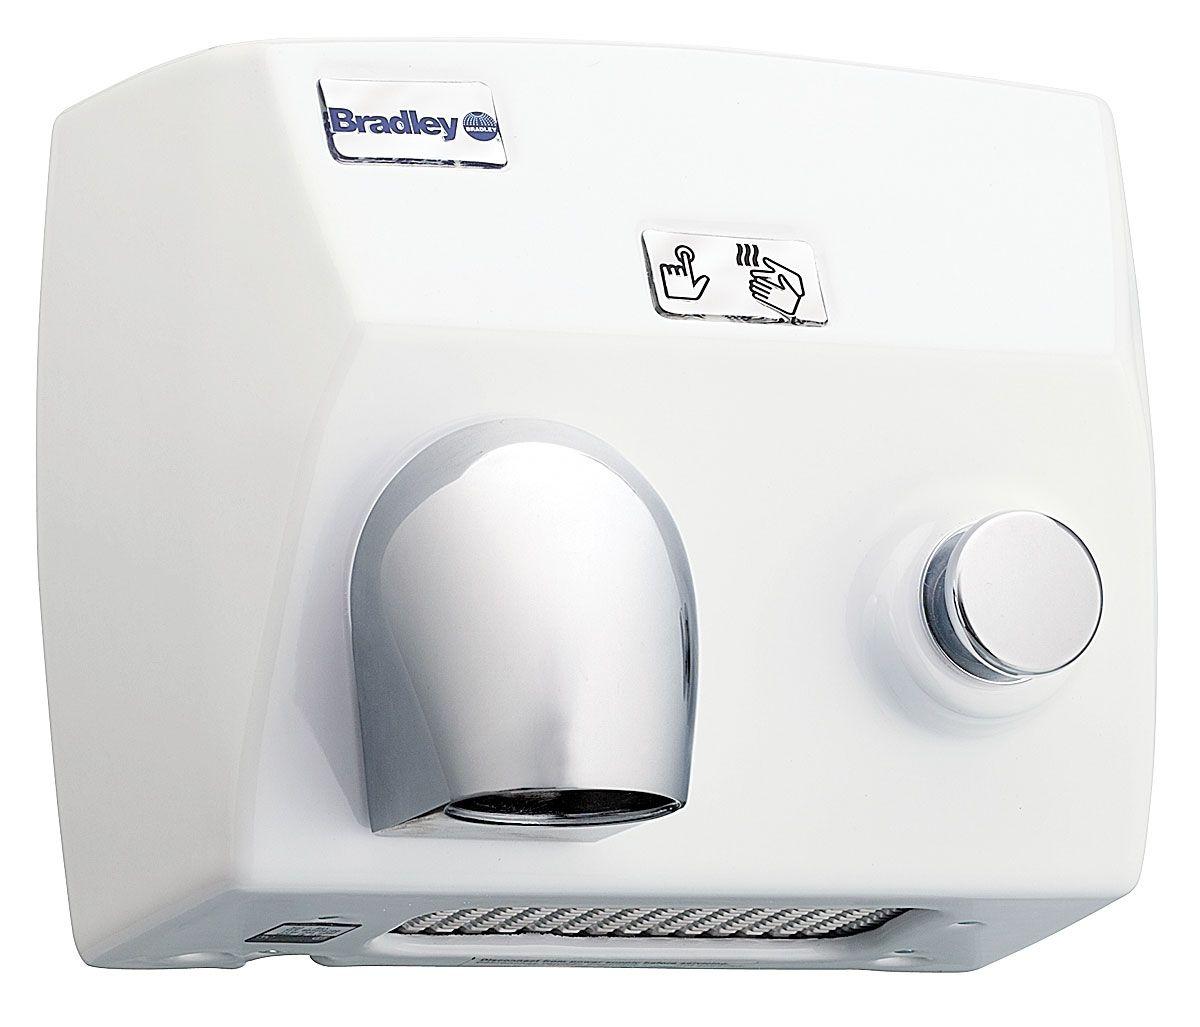 hand dryer 2873 | hand dryer #mediclinics | pinterest | dryer